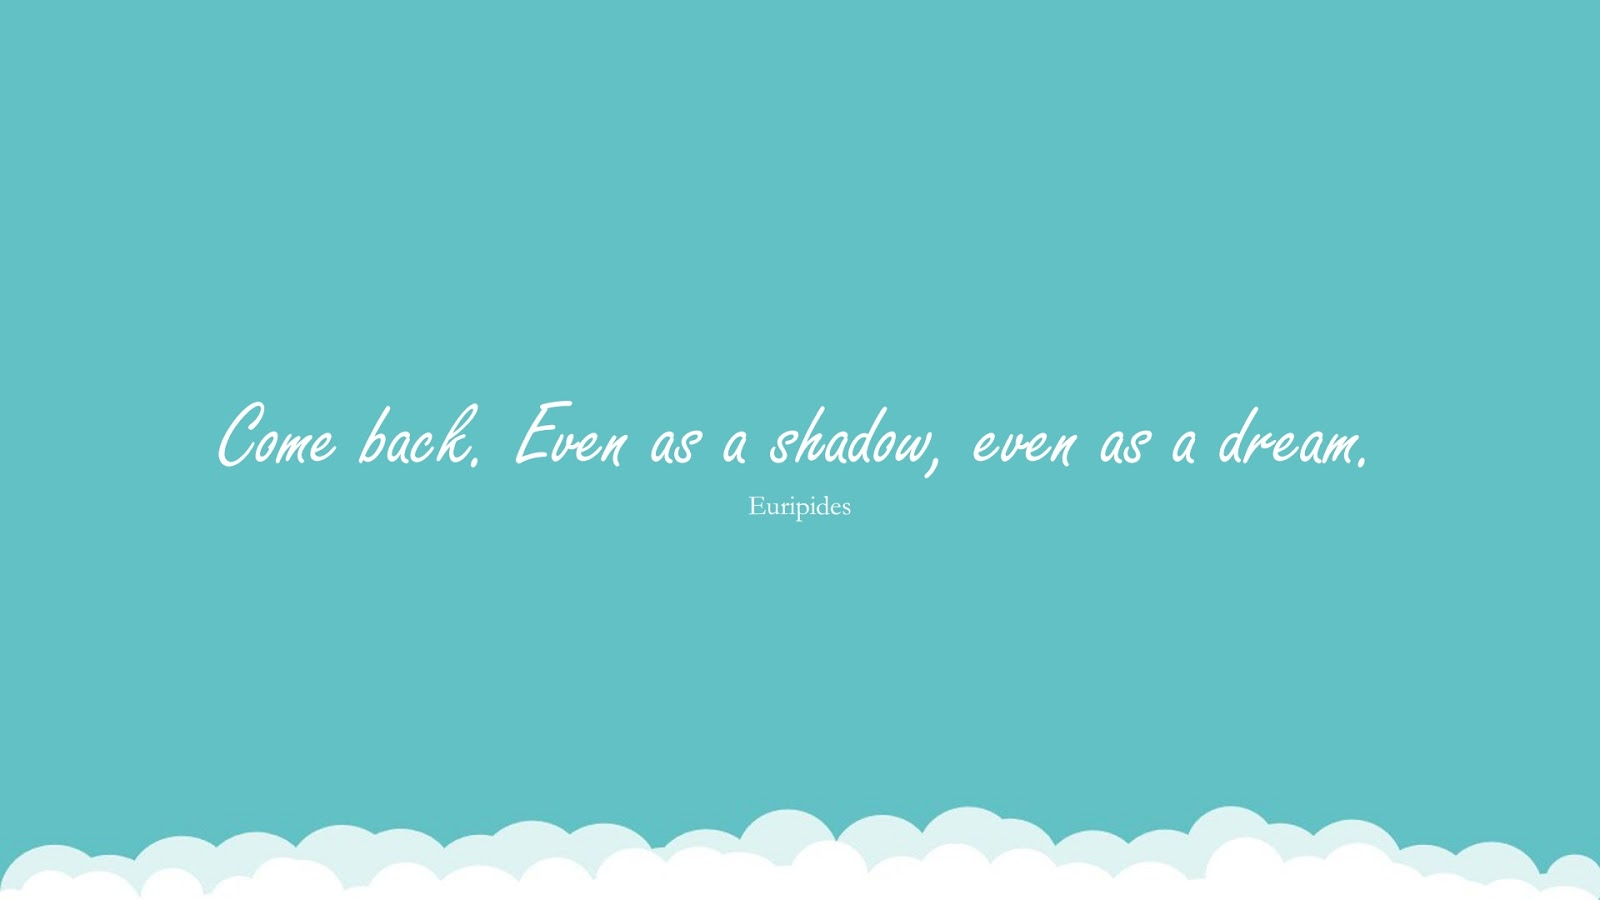 Come back. Even as a shadow, even as a dream. (Euripides);  #FamilyQuotes